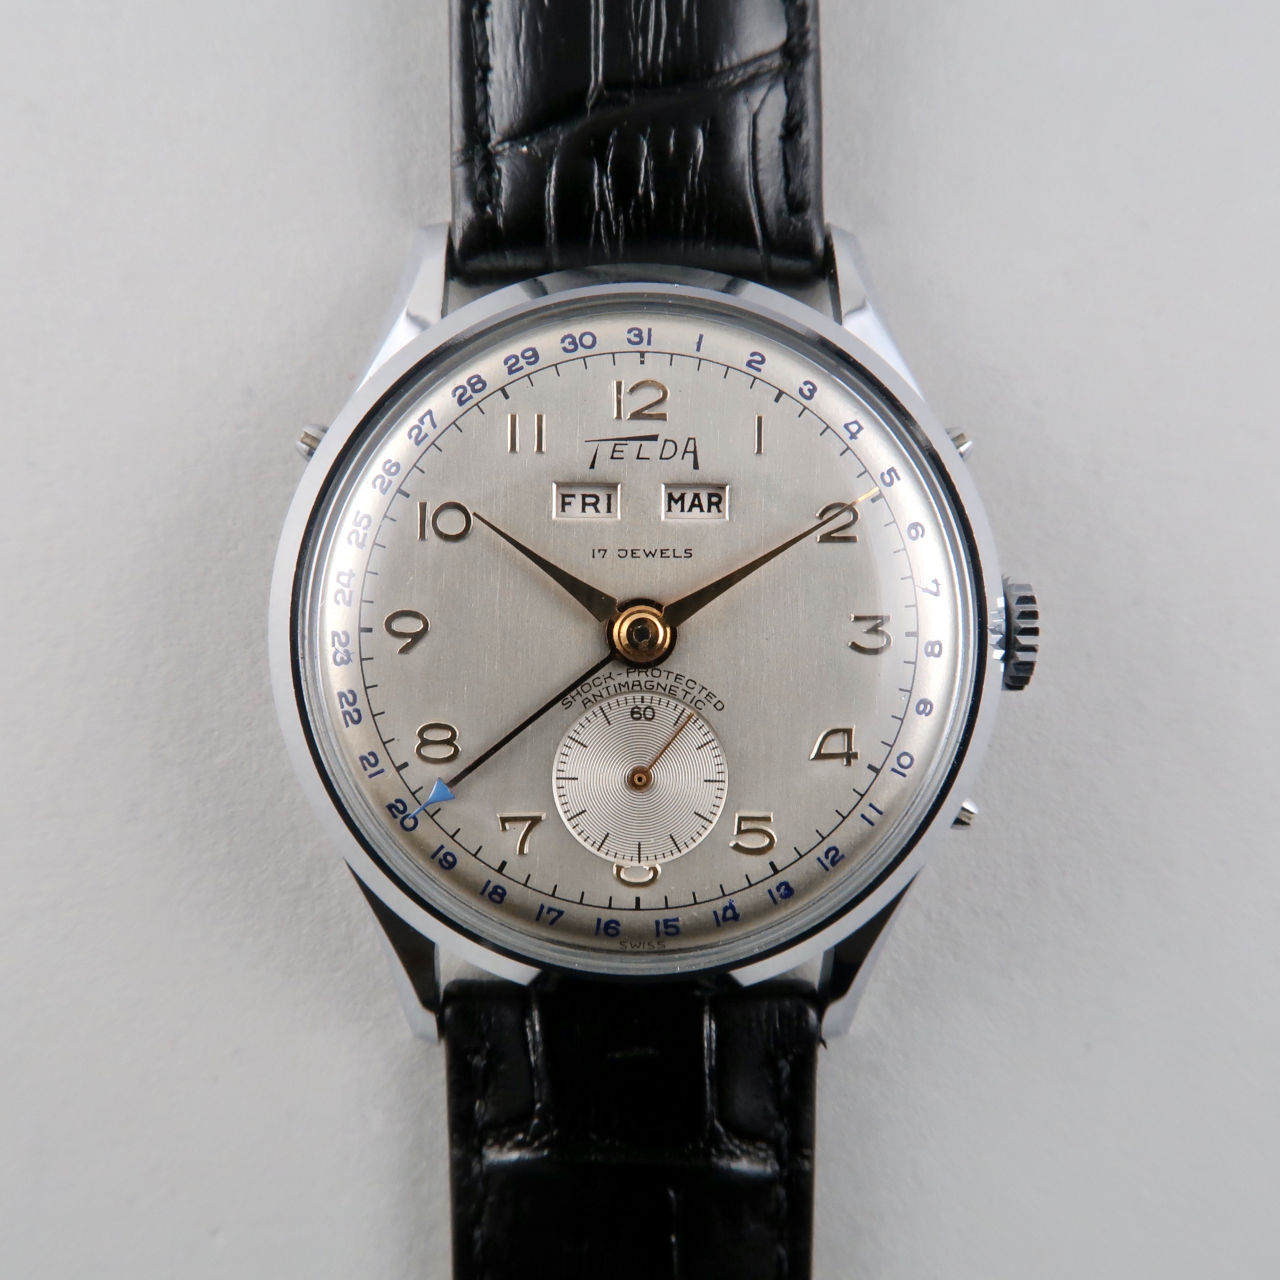 Telda circa 1950 | chrome & steel triple calendar wristwatch